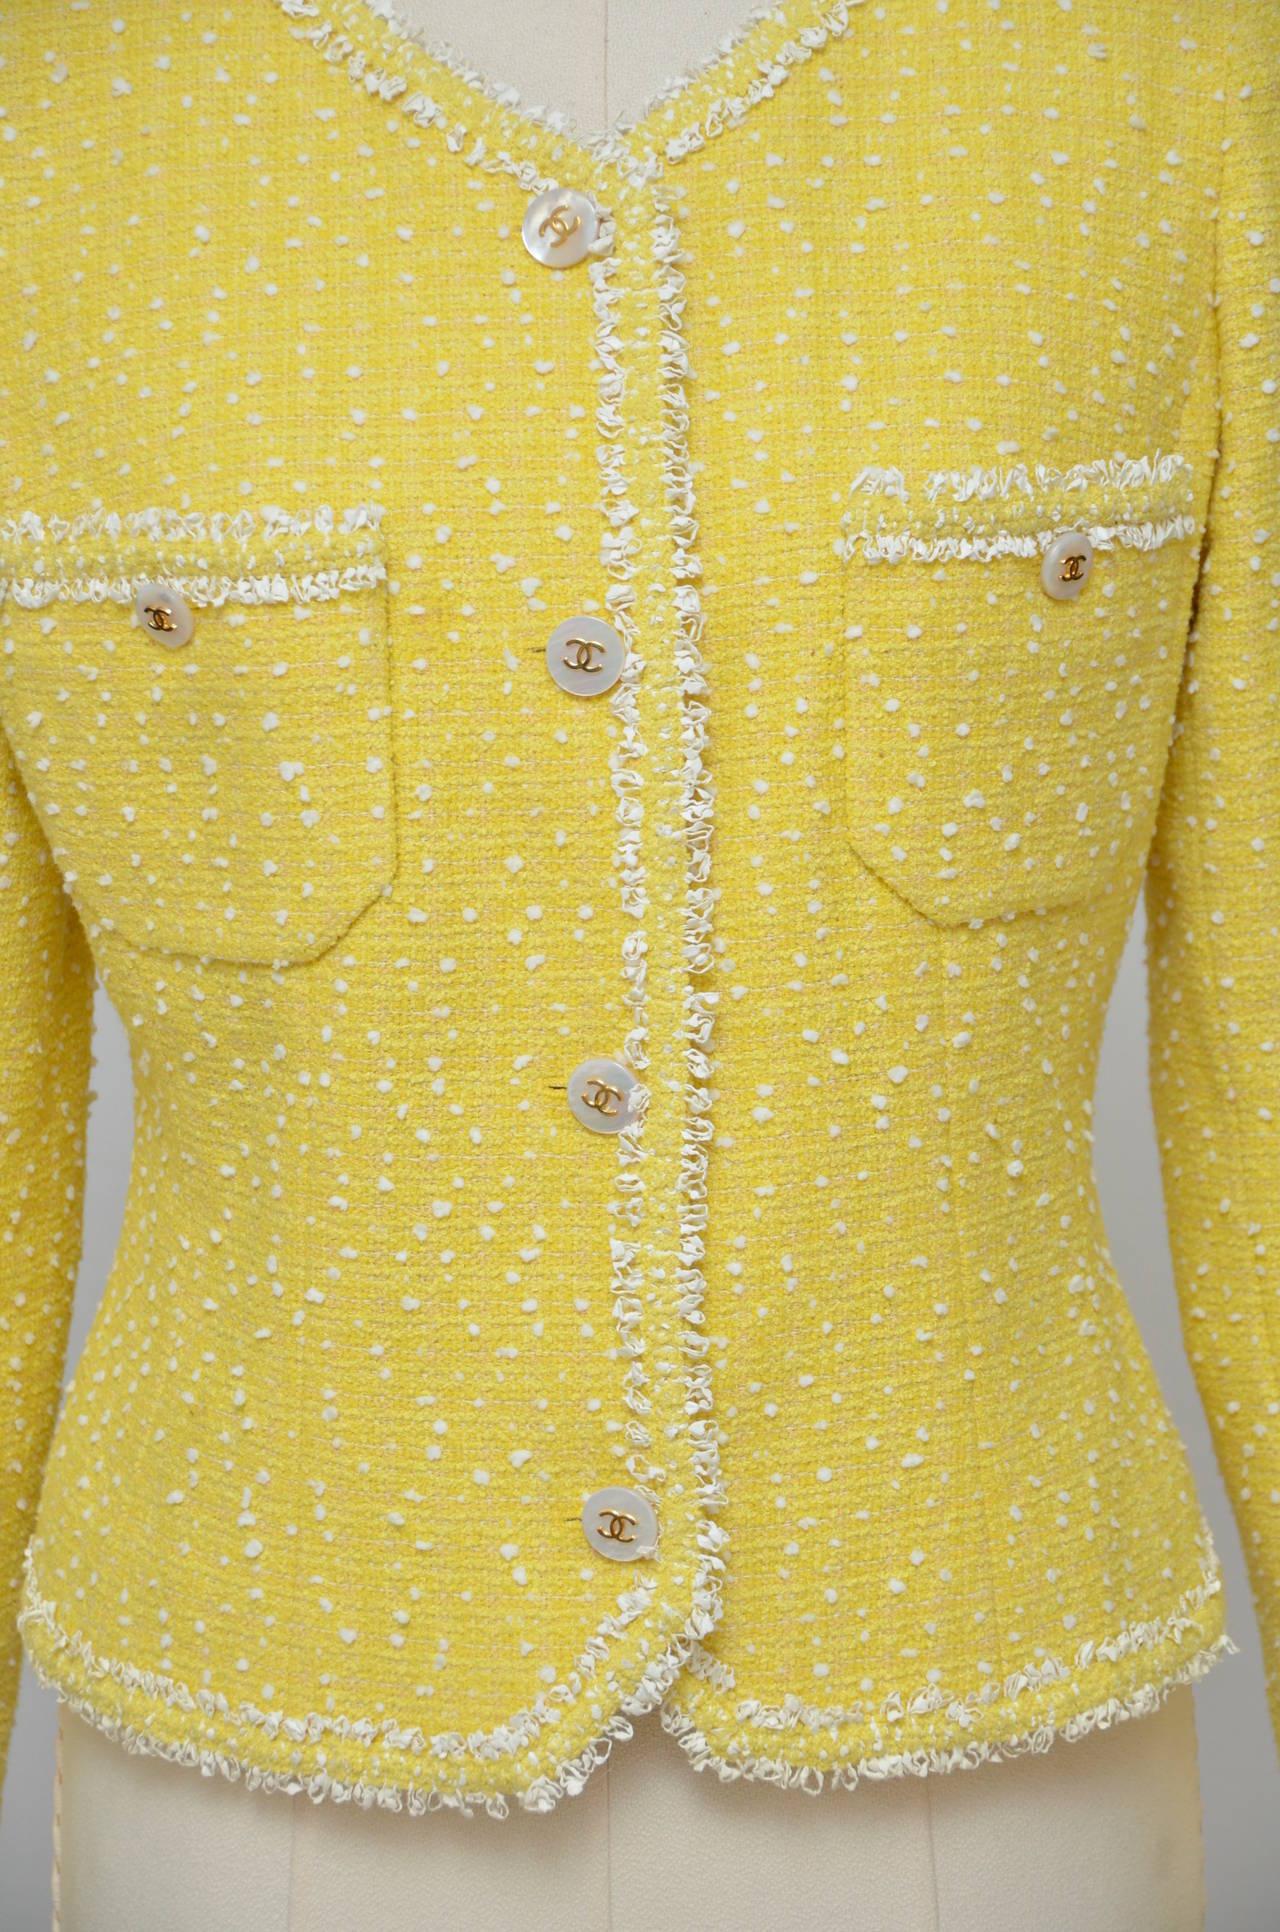 Vintage Chanel Yellow Boucle Tweed Jacket 1997 Mint Size